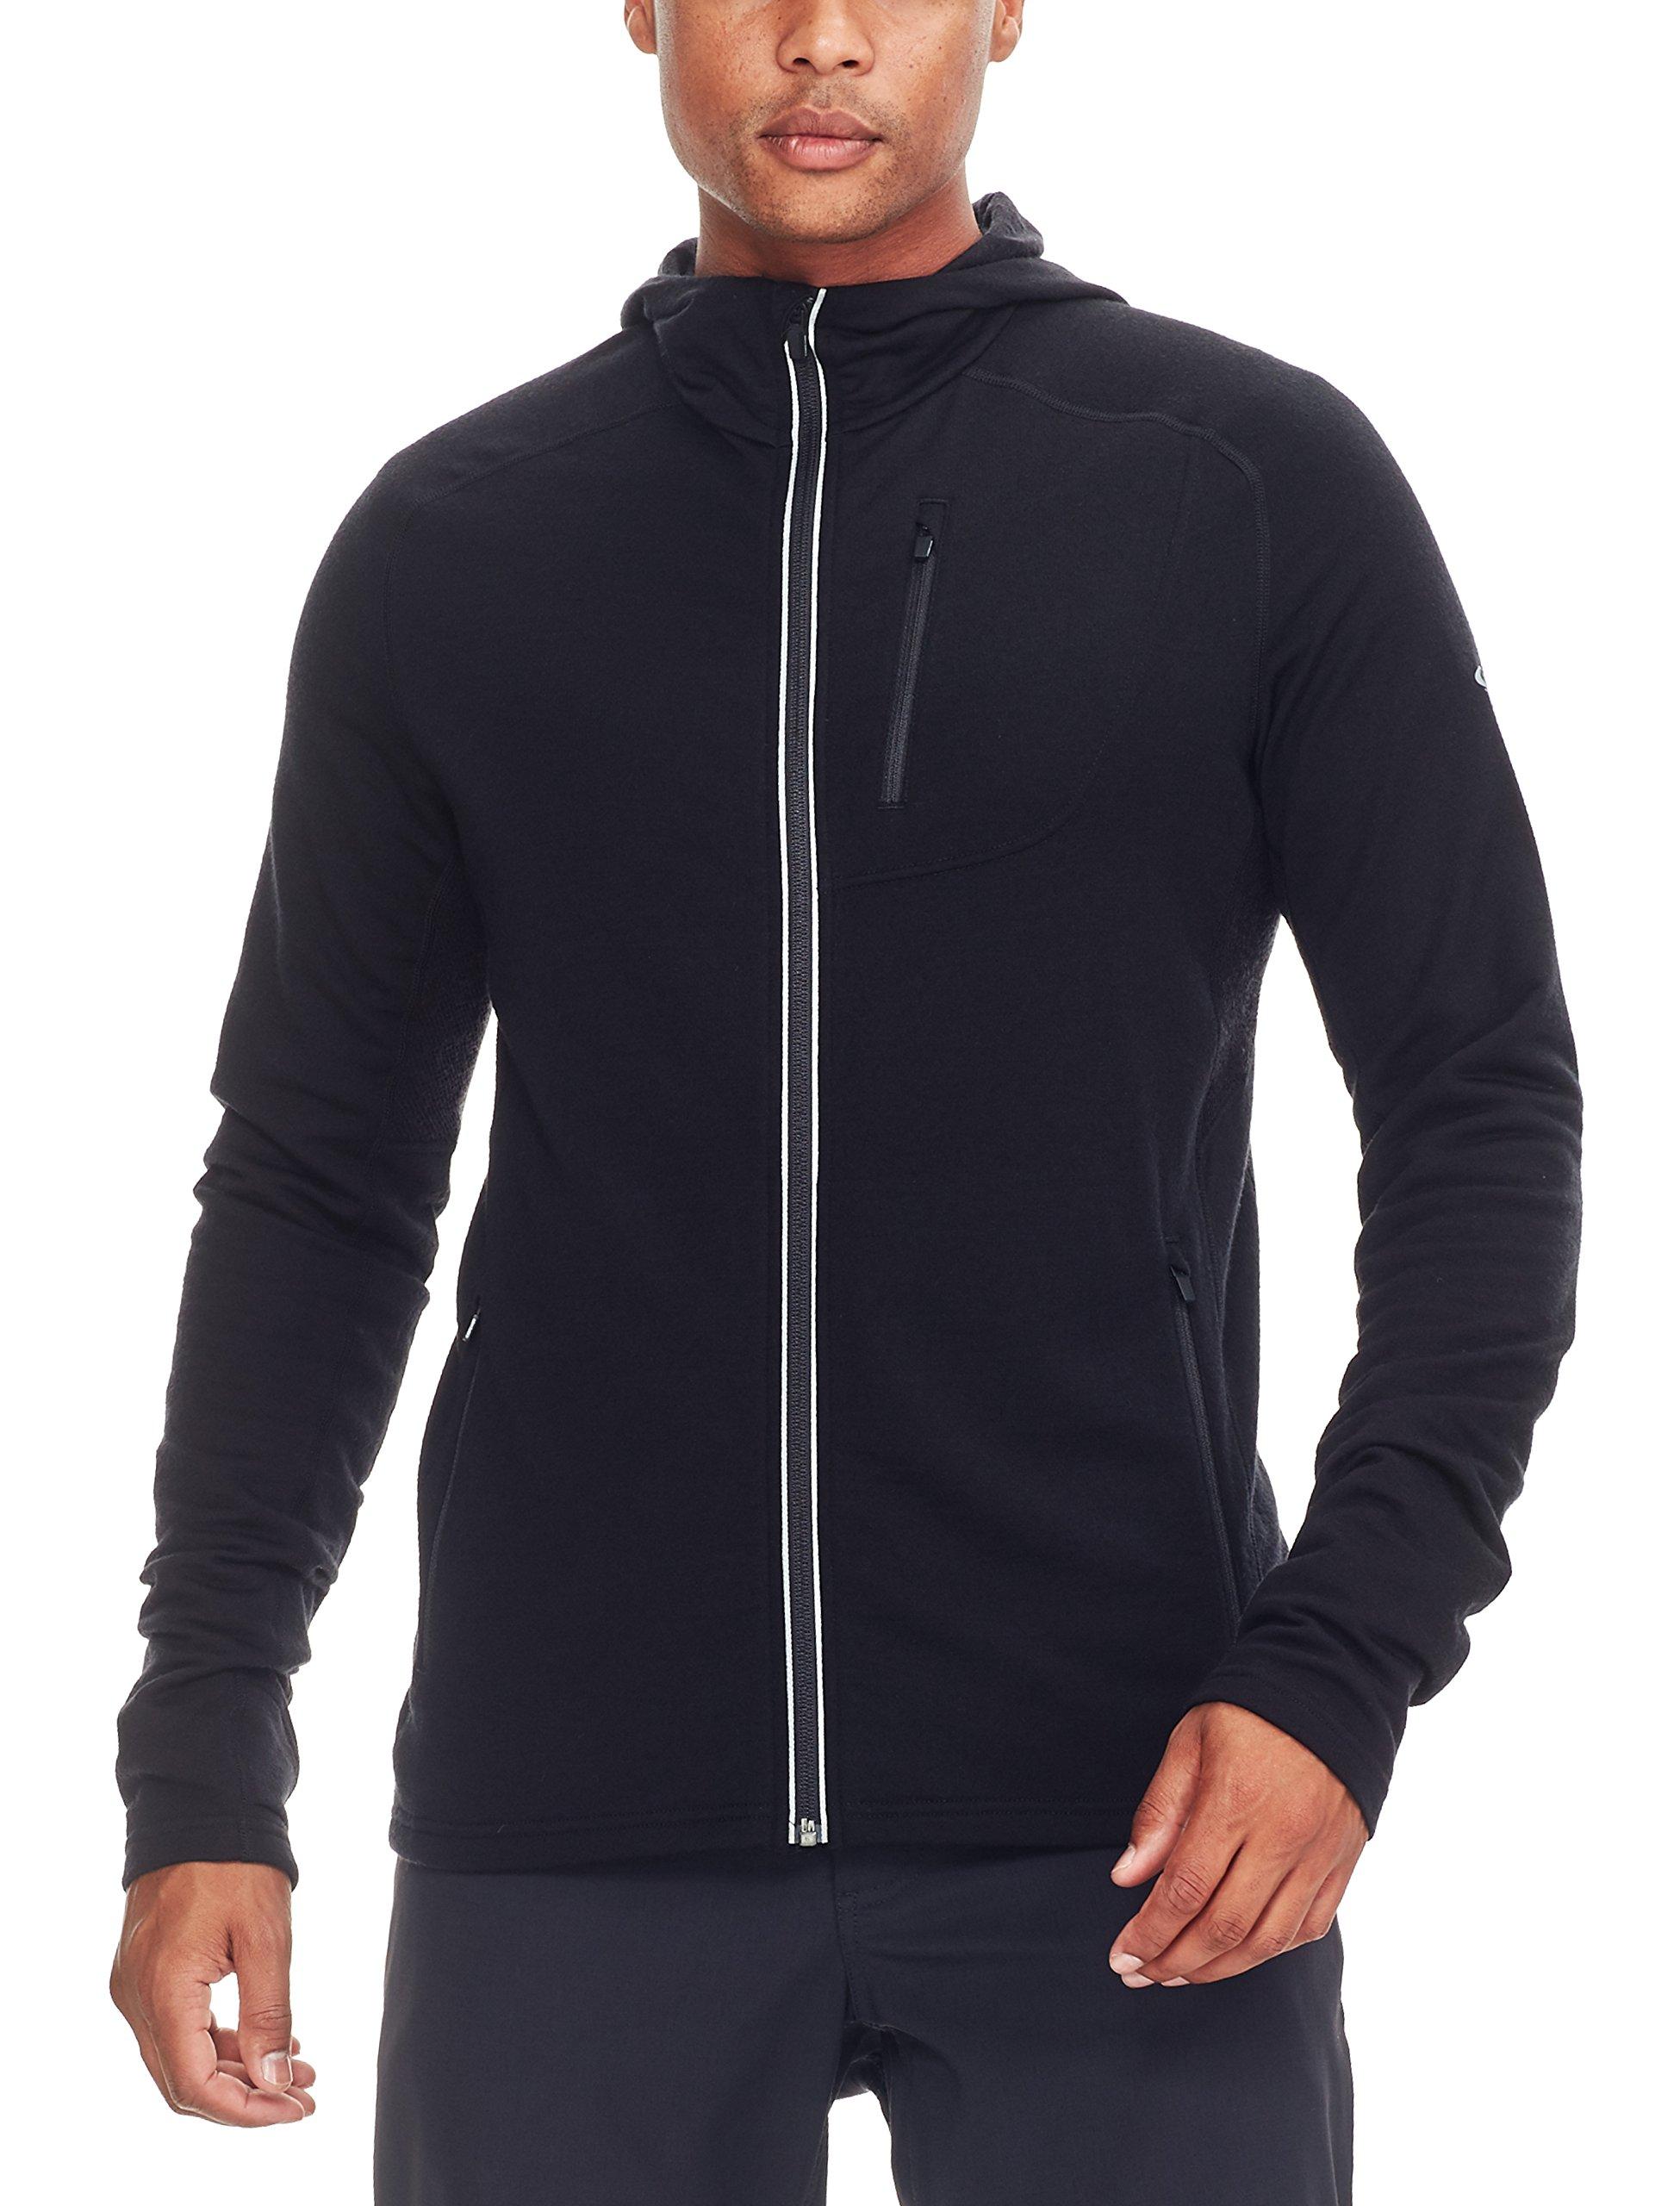 81kQd3fMuEL - Icebreaker Men's Quantum Long Sleeve Zip Hood Cover Ups